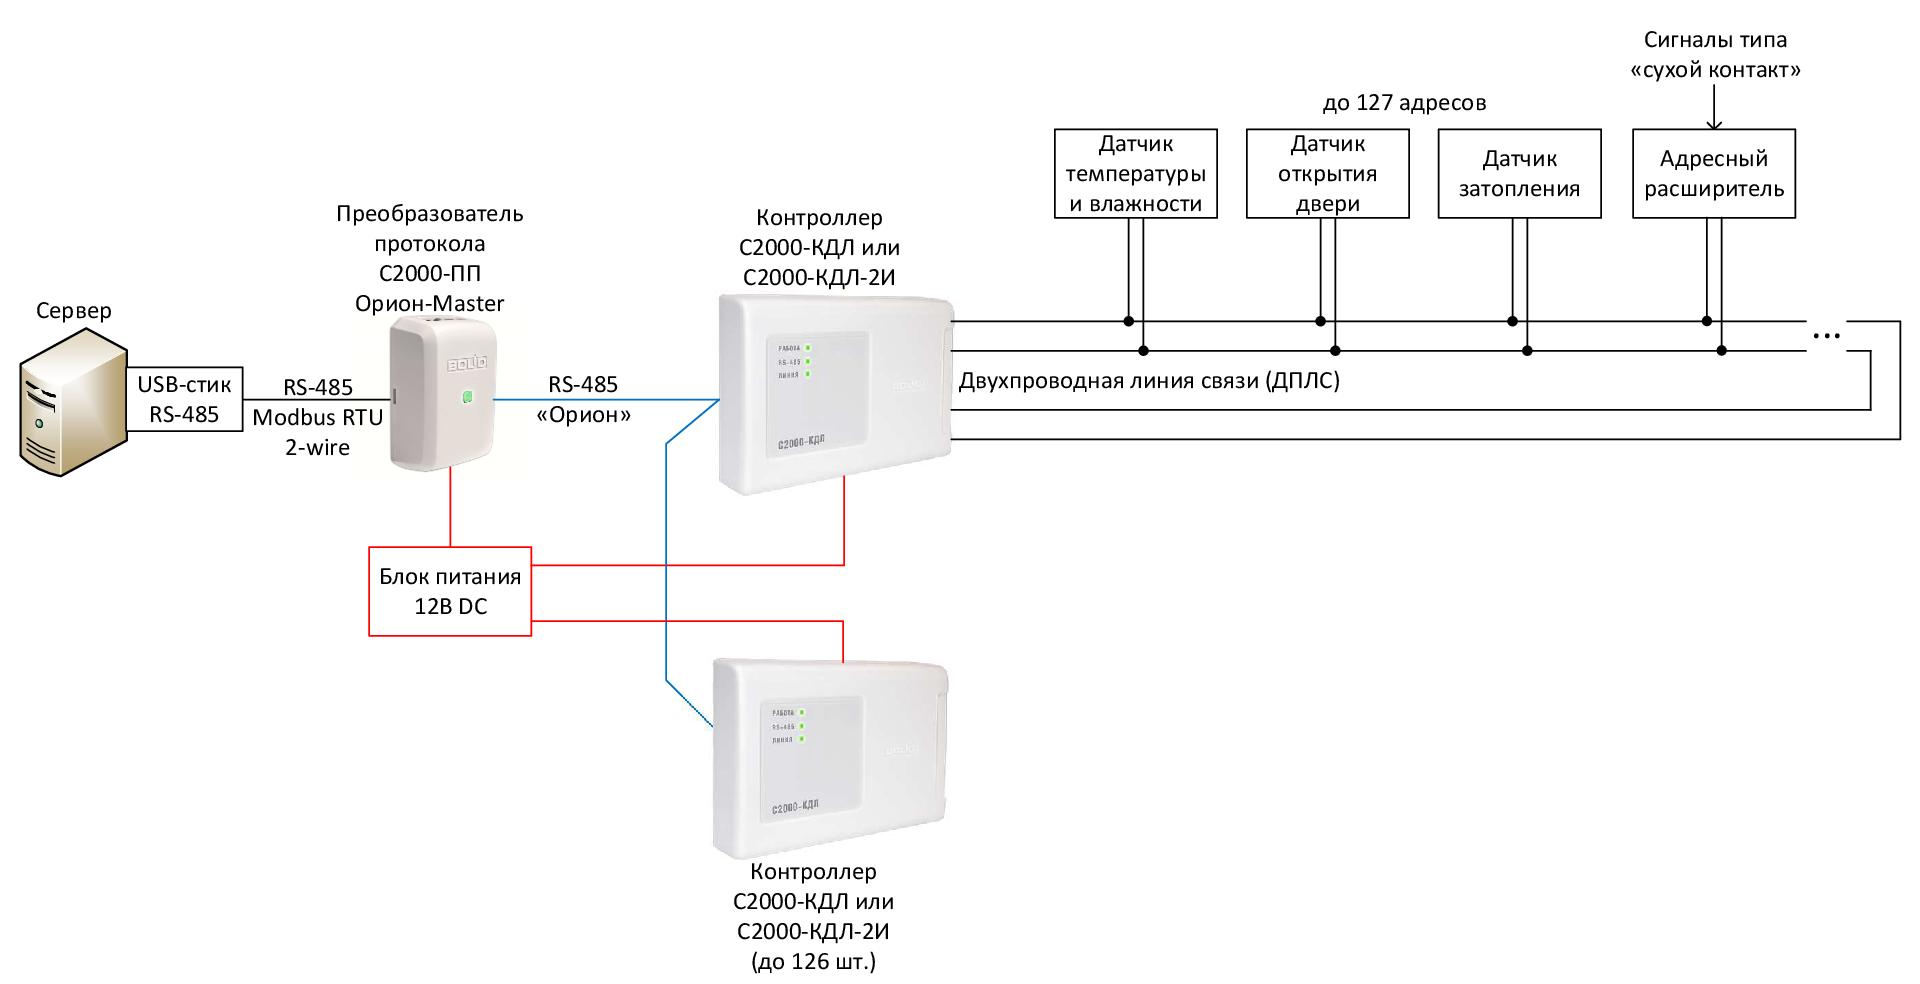 Environmental monitoring in the server room (Bolid + Zabbix)